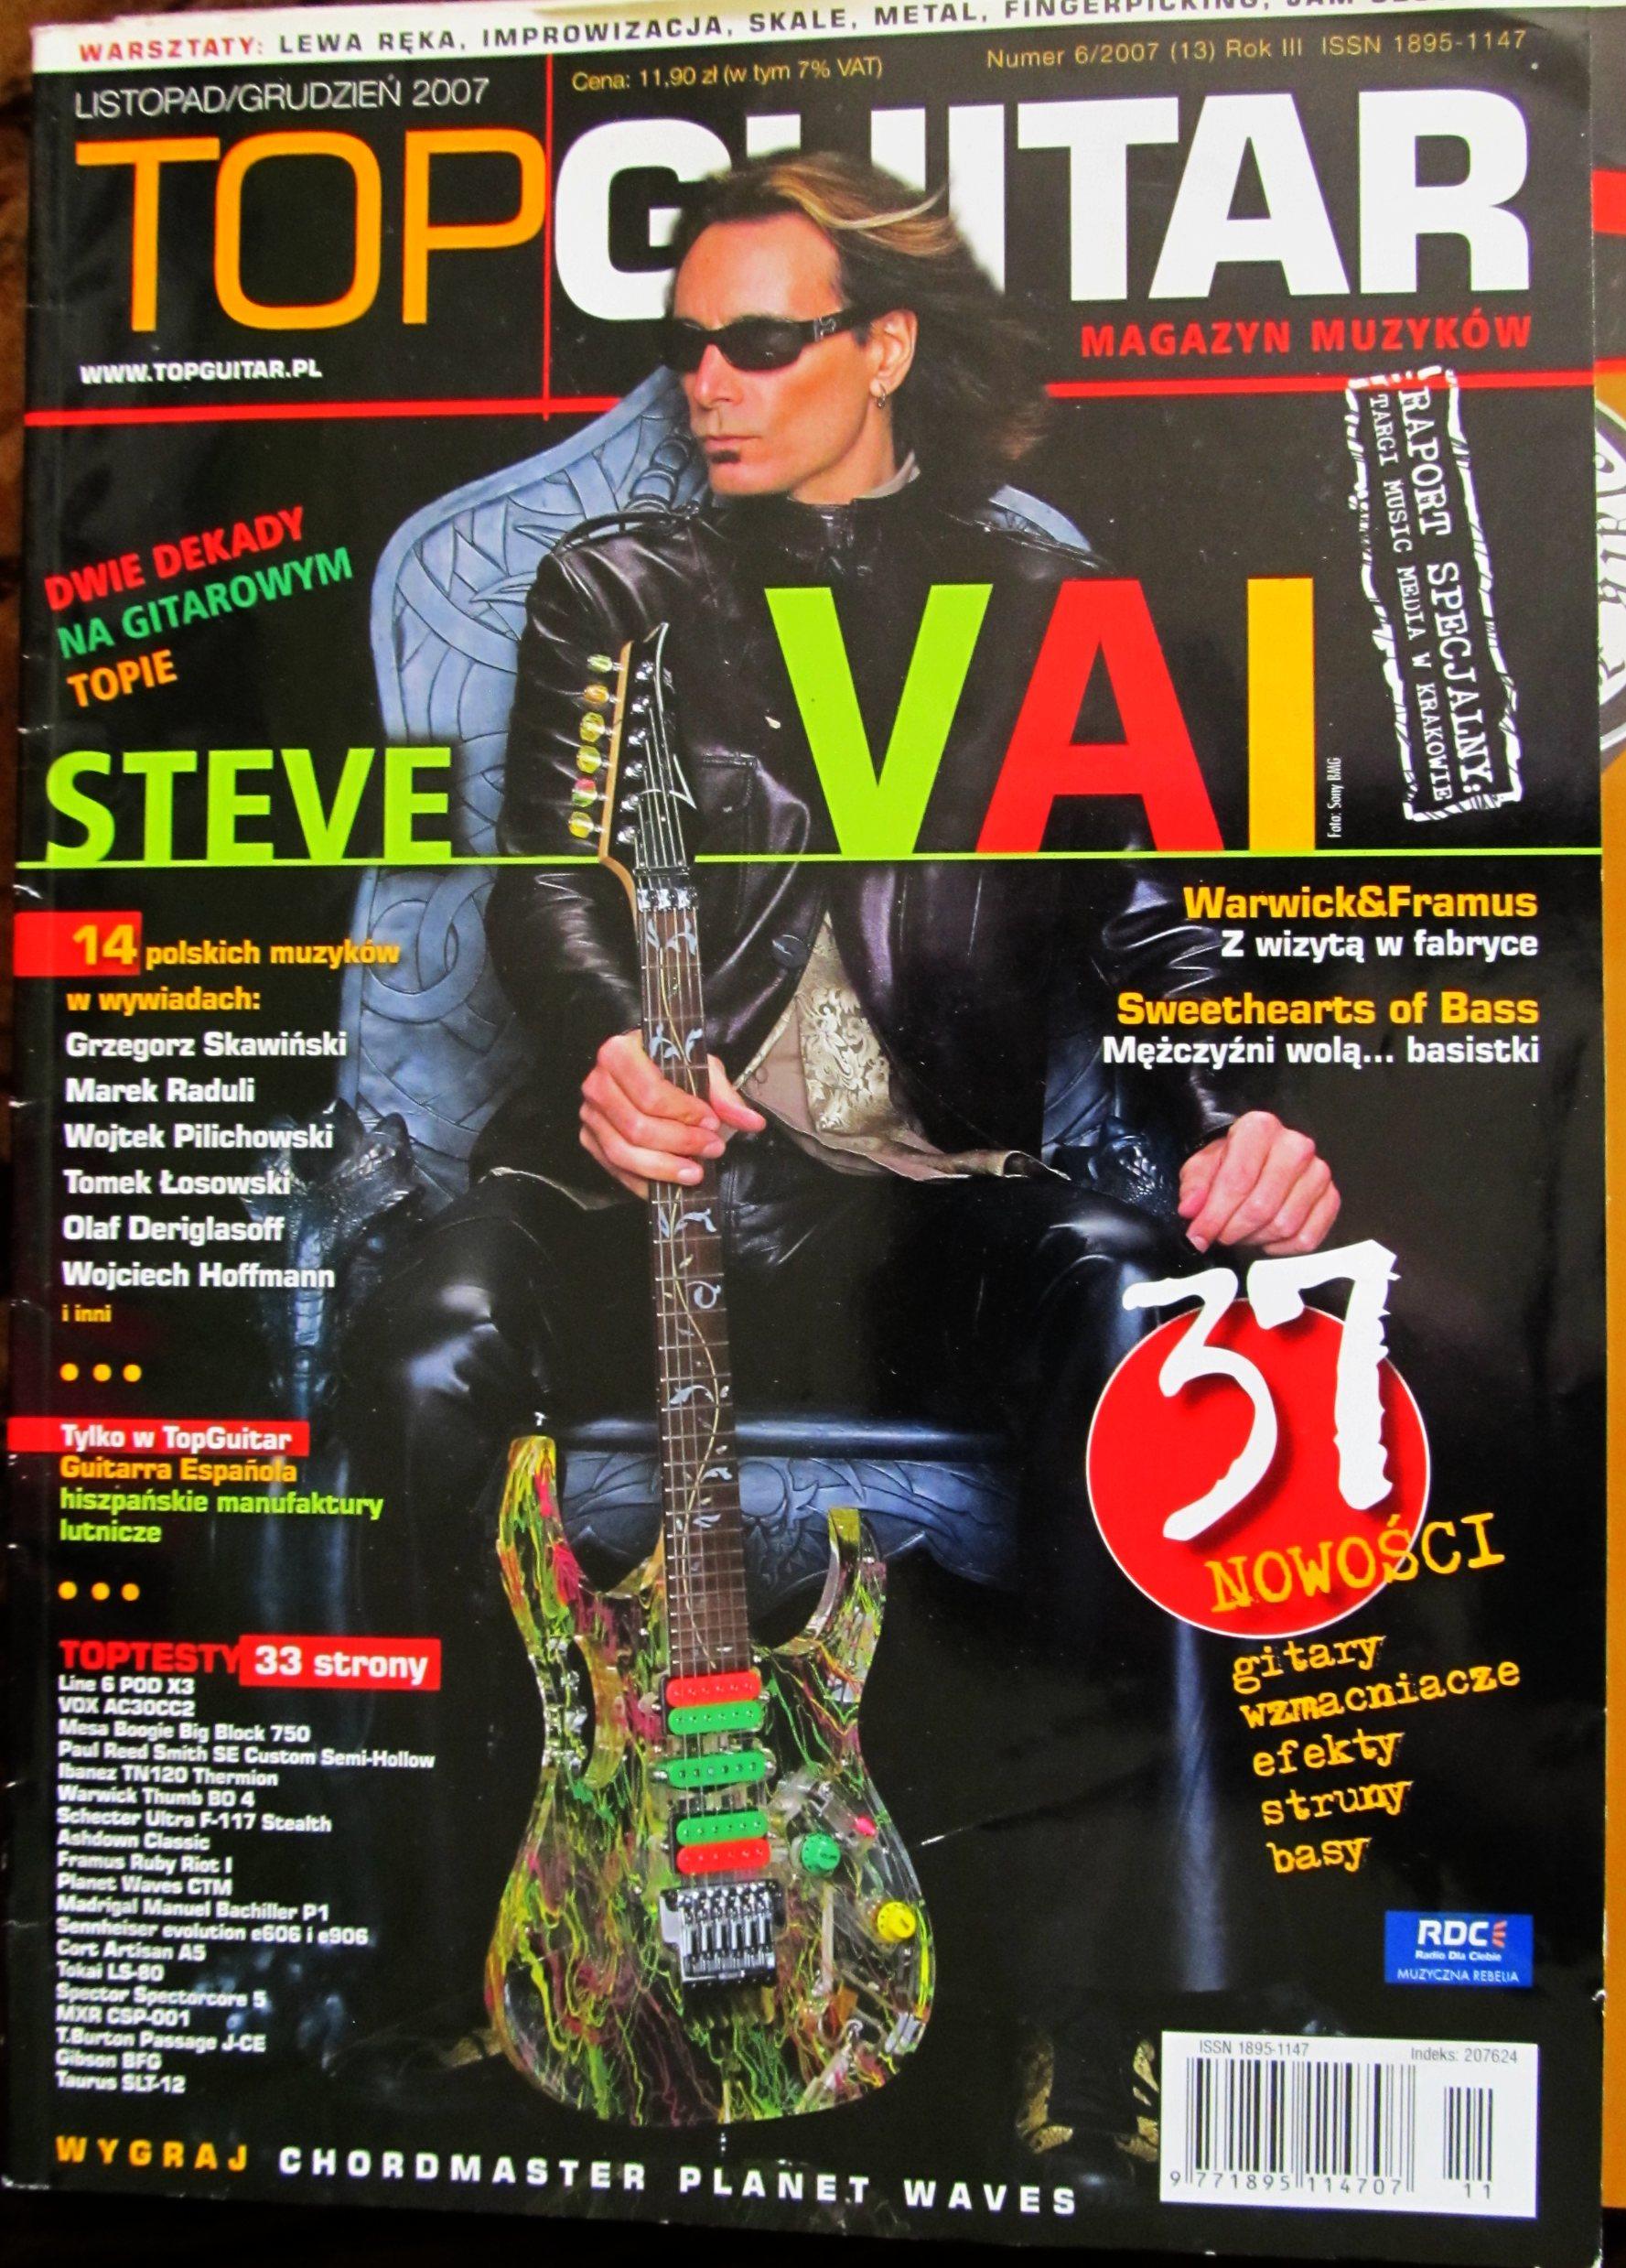 schemat /aukcje/Czasopisma Top_Guitar_Steve_Vai_11-12-2007.jpg